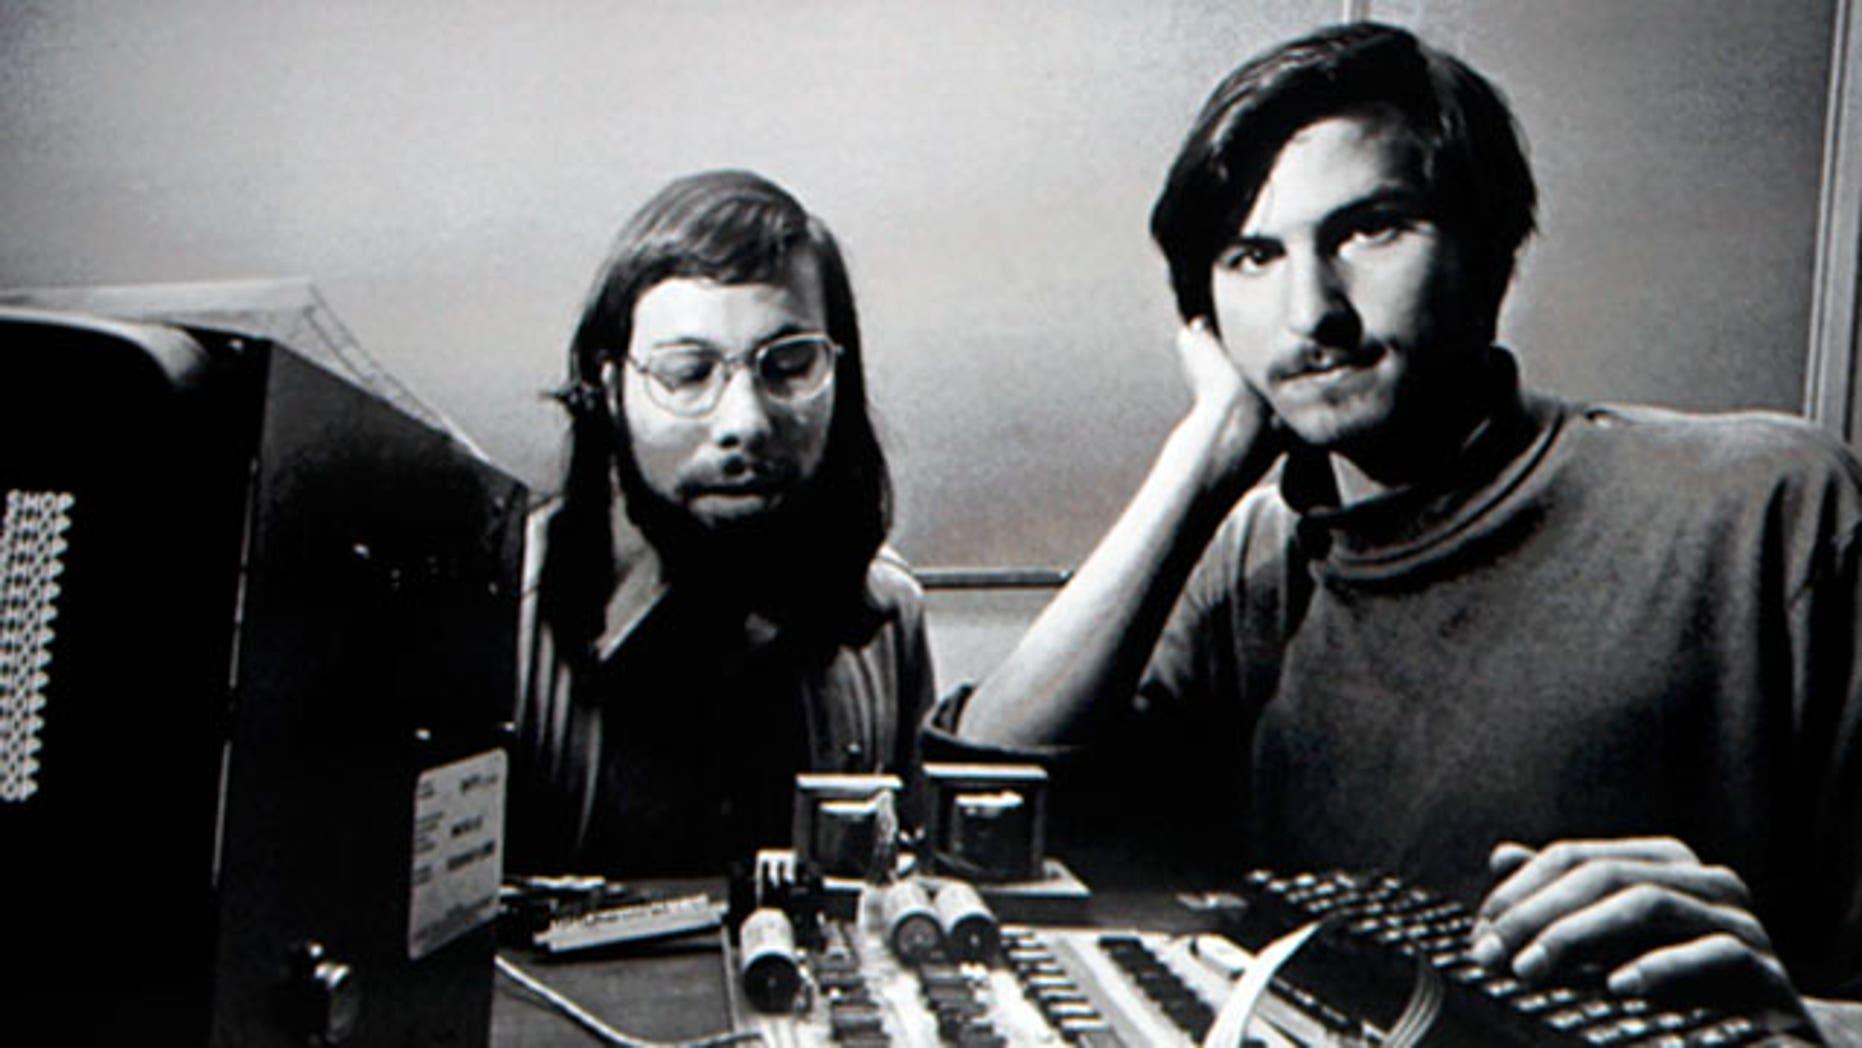 Apple co-founders Steve Jobs and Steve Wozniak.